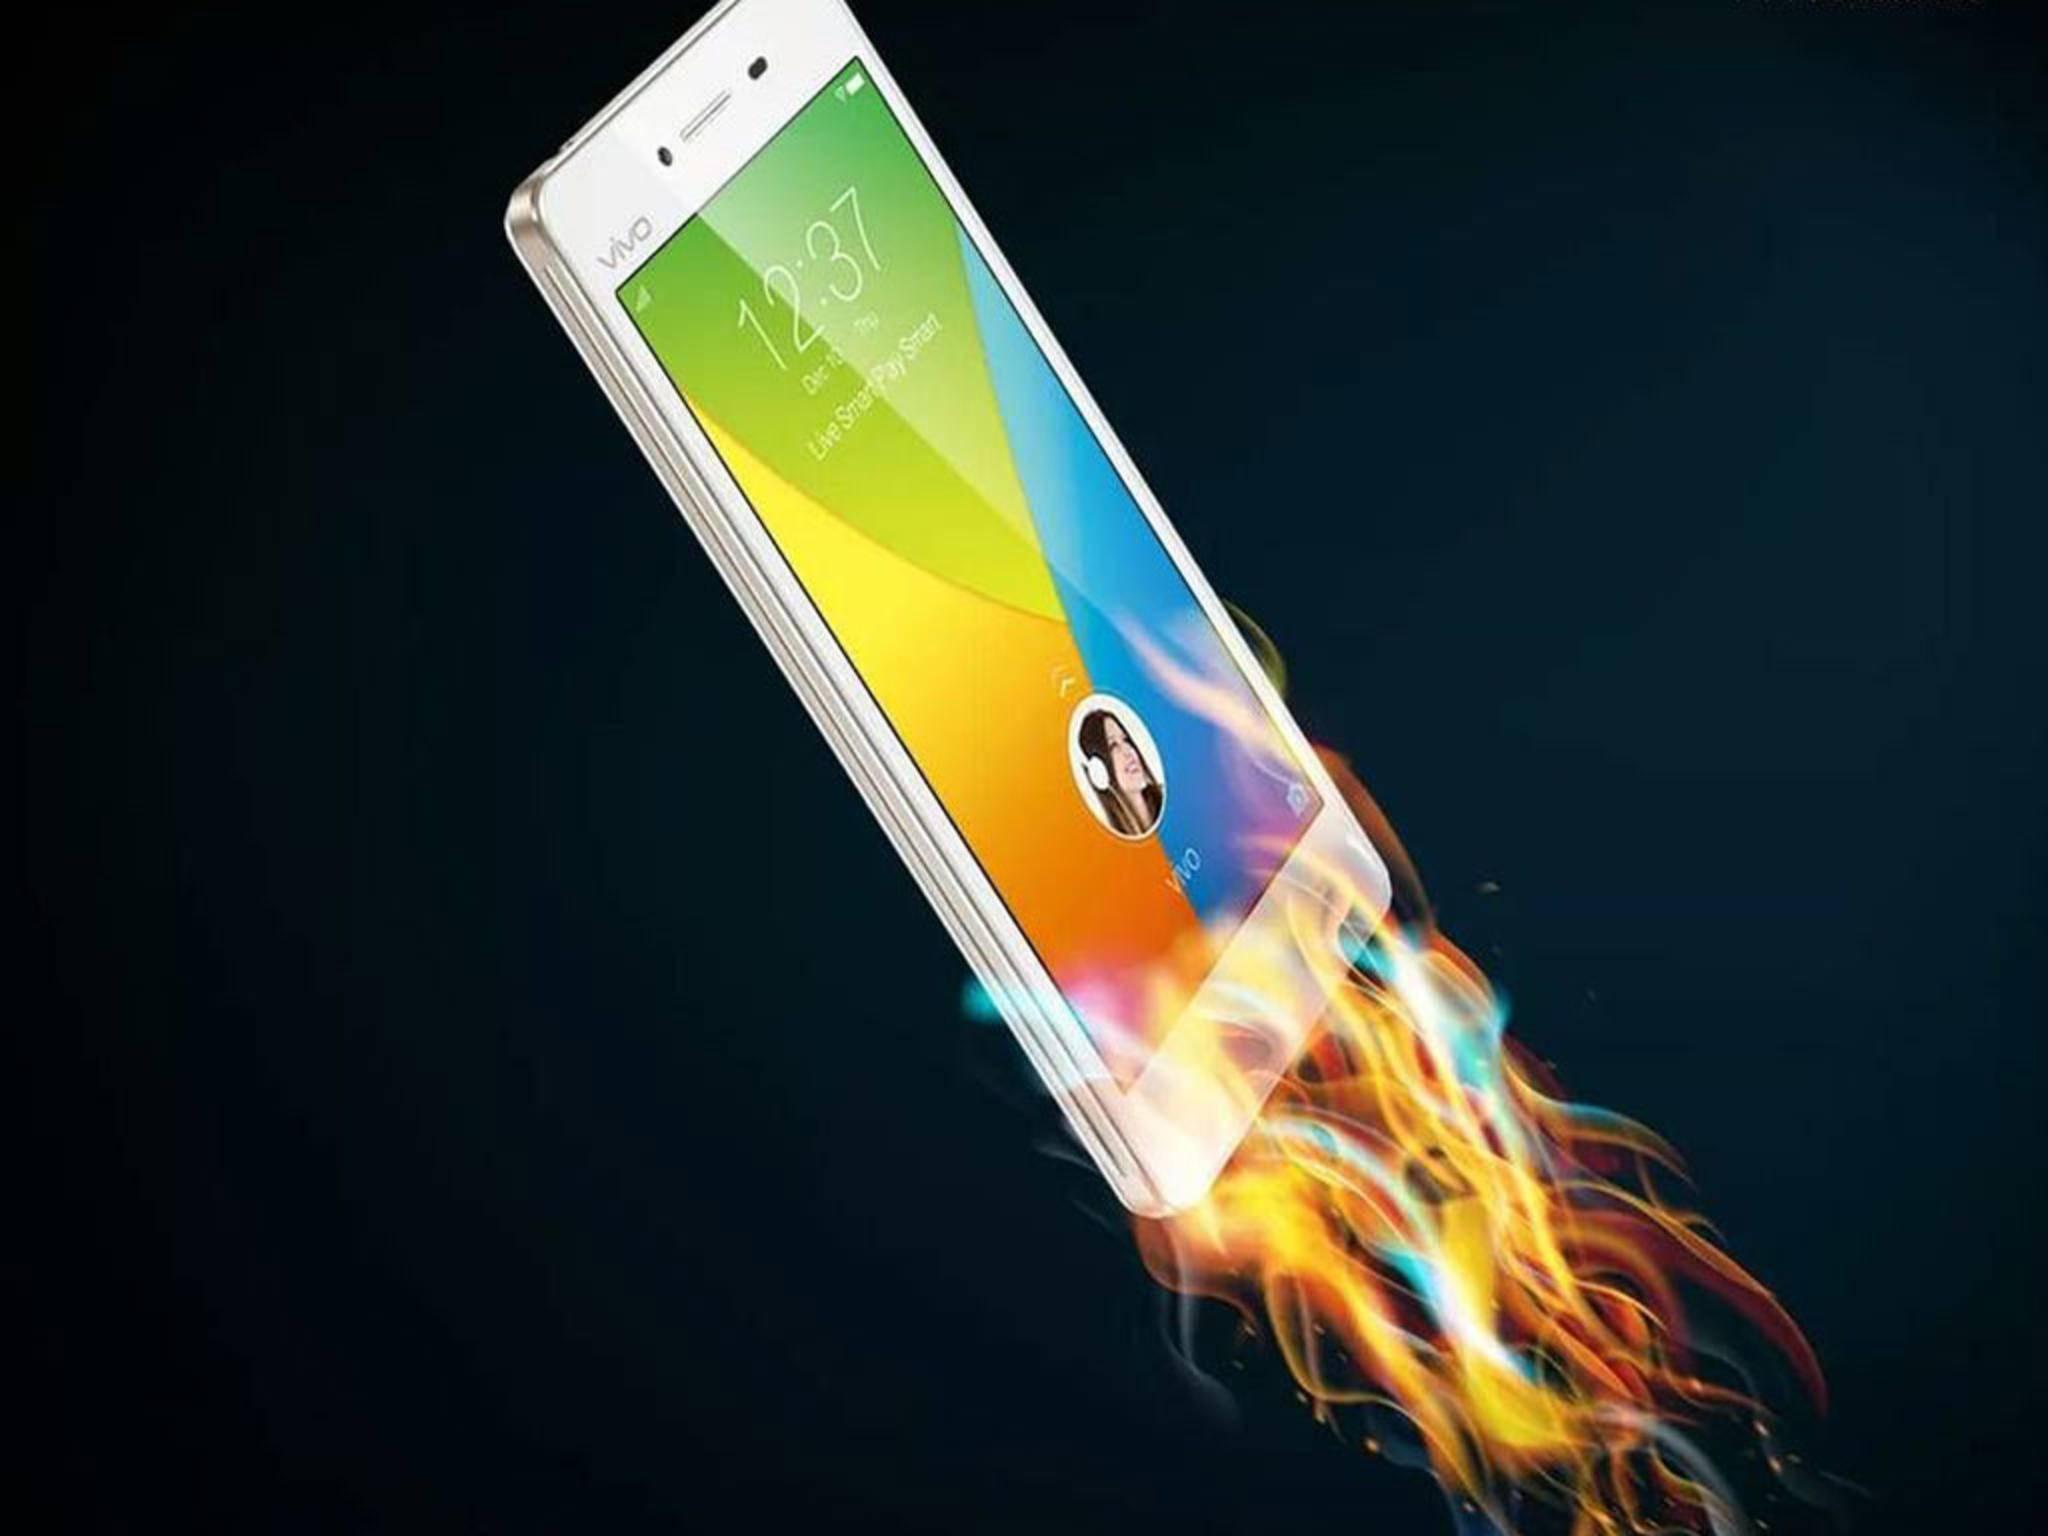 In den Top 10 der besten Smartphone-Performer dominieren chinesische Hersteller.